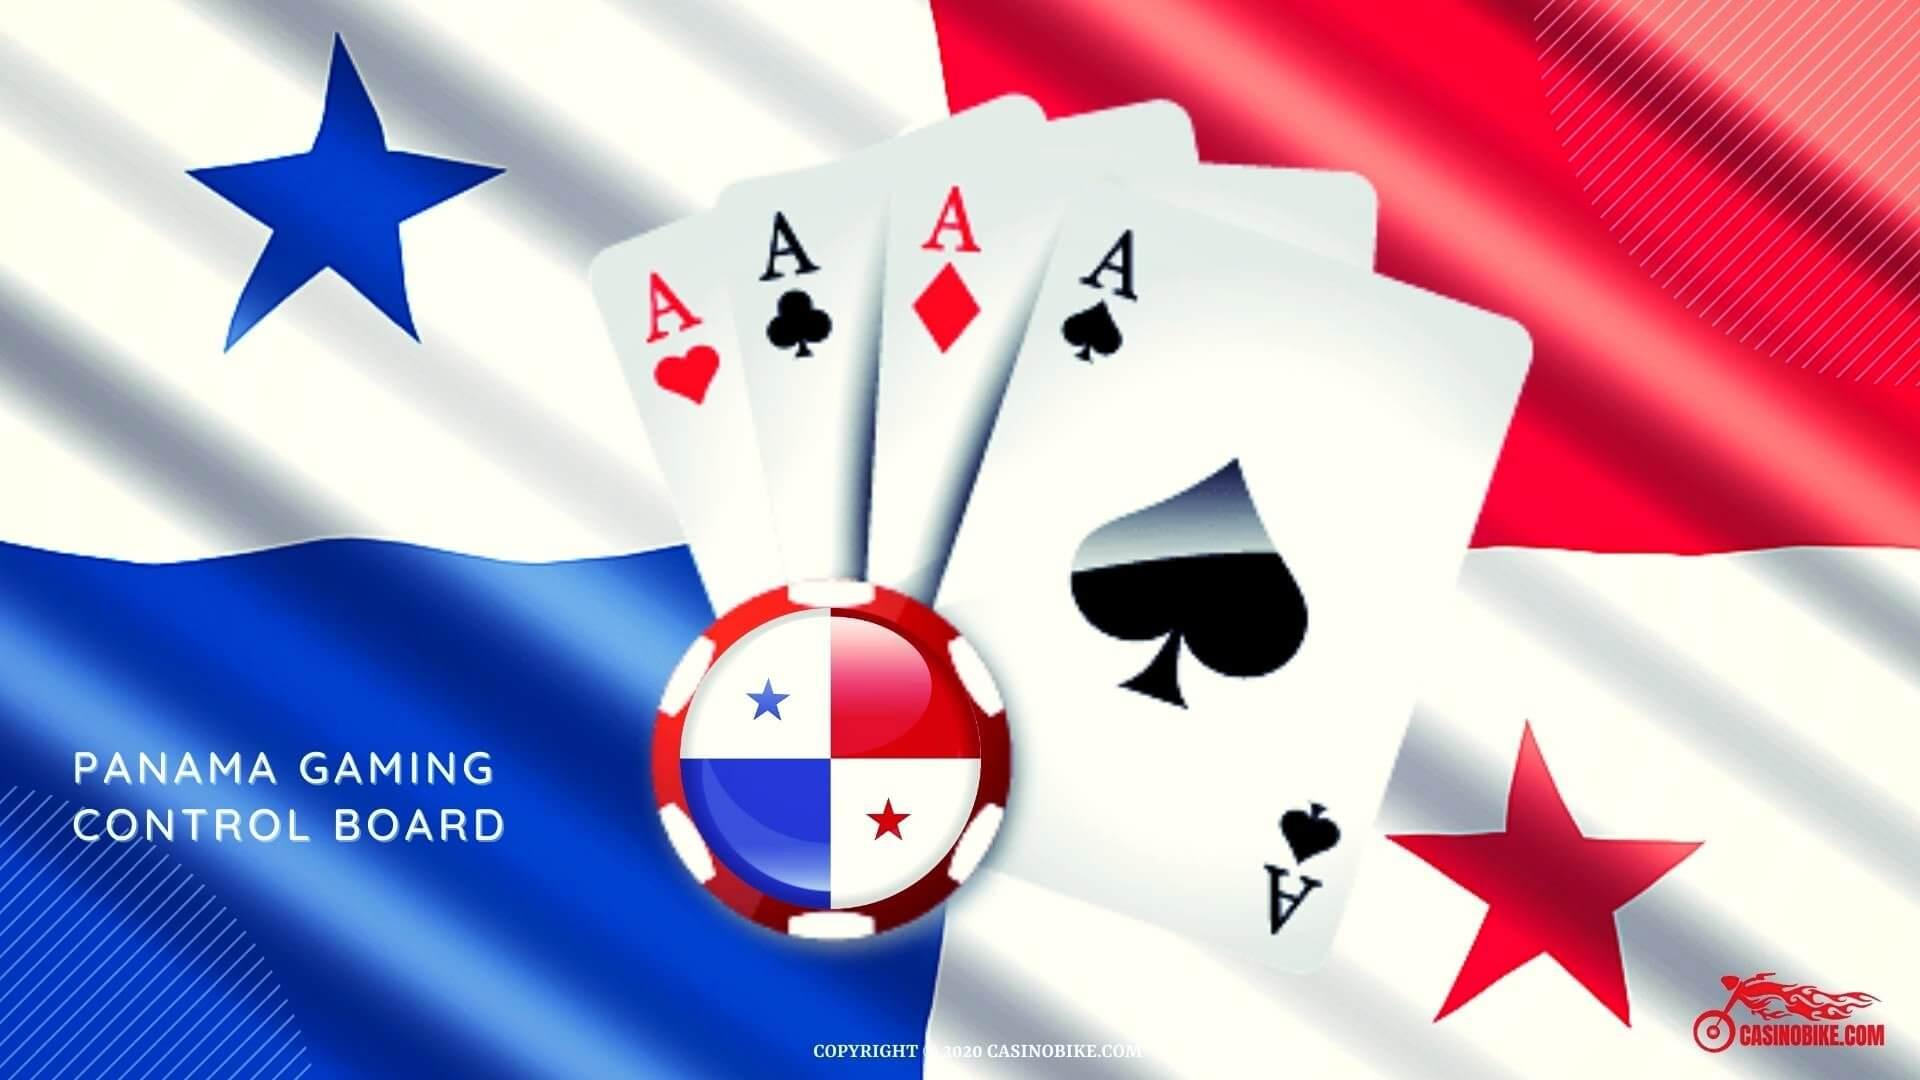 Panama Gaming Control Board Online Casinos